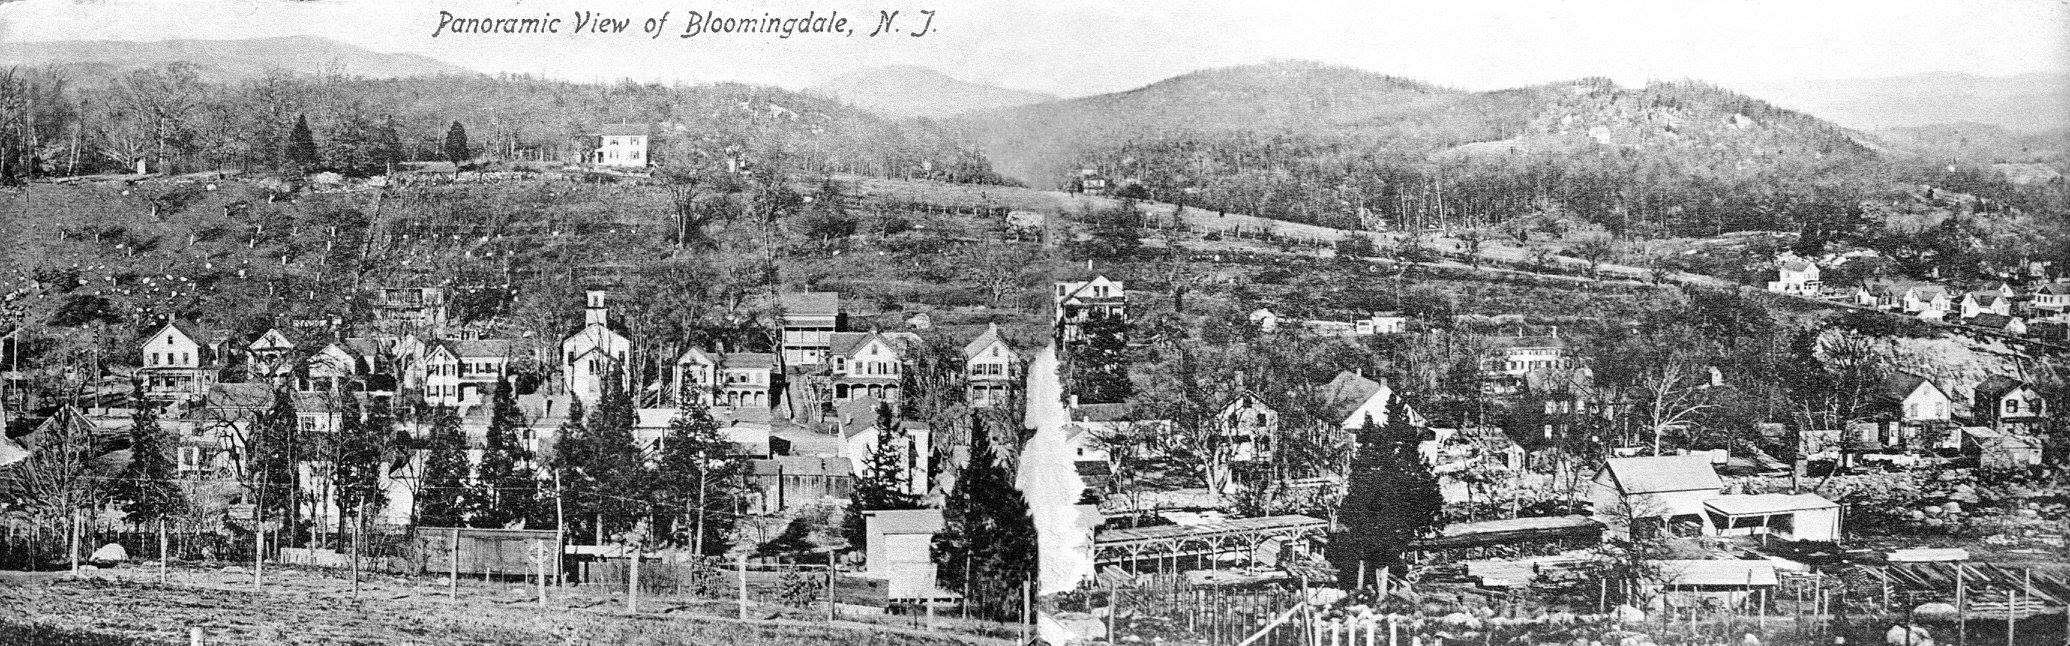 Panoramic View of Bloomingdale NJ (undated)